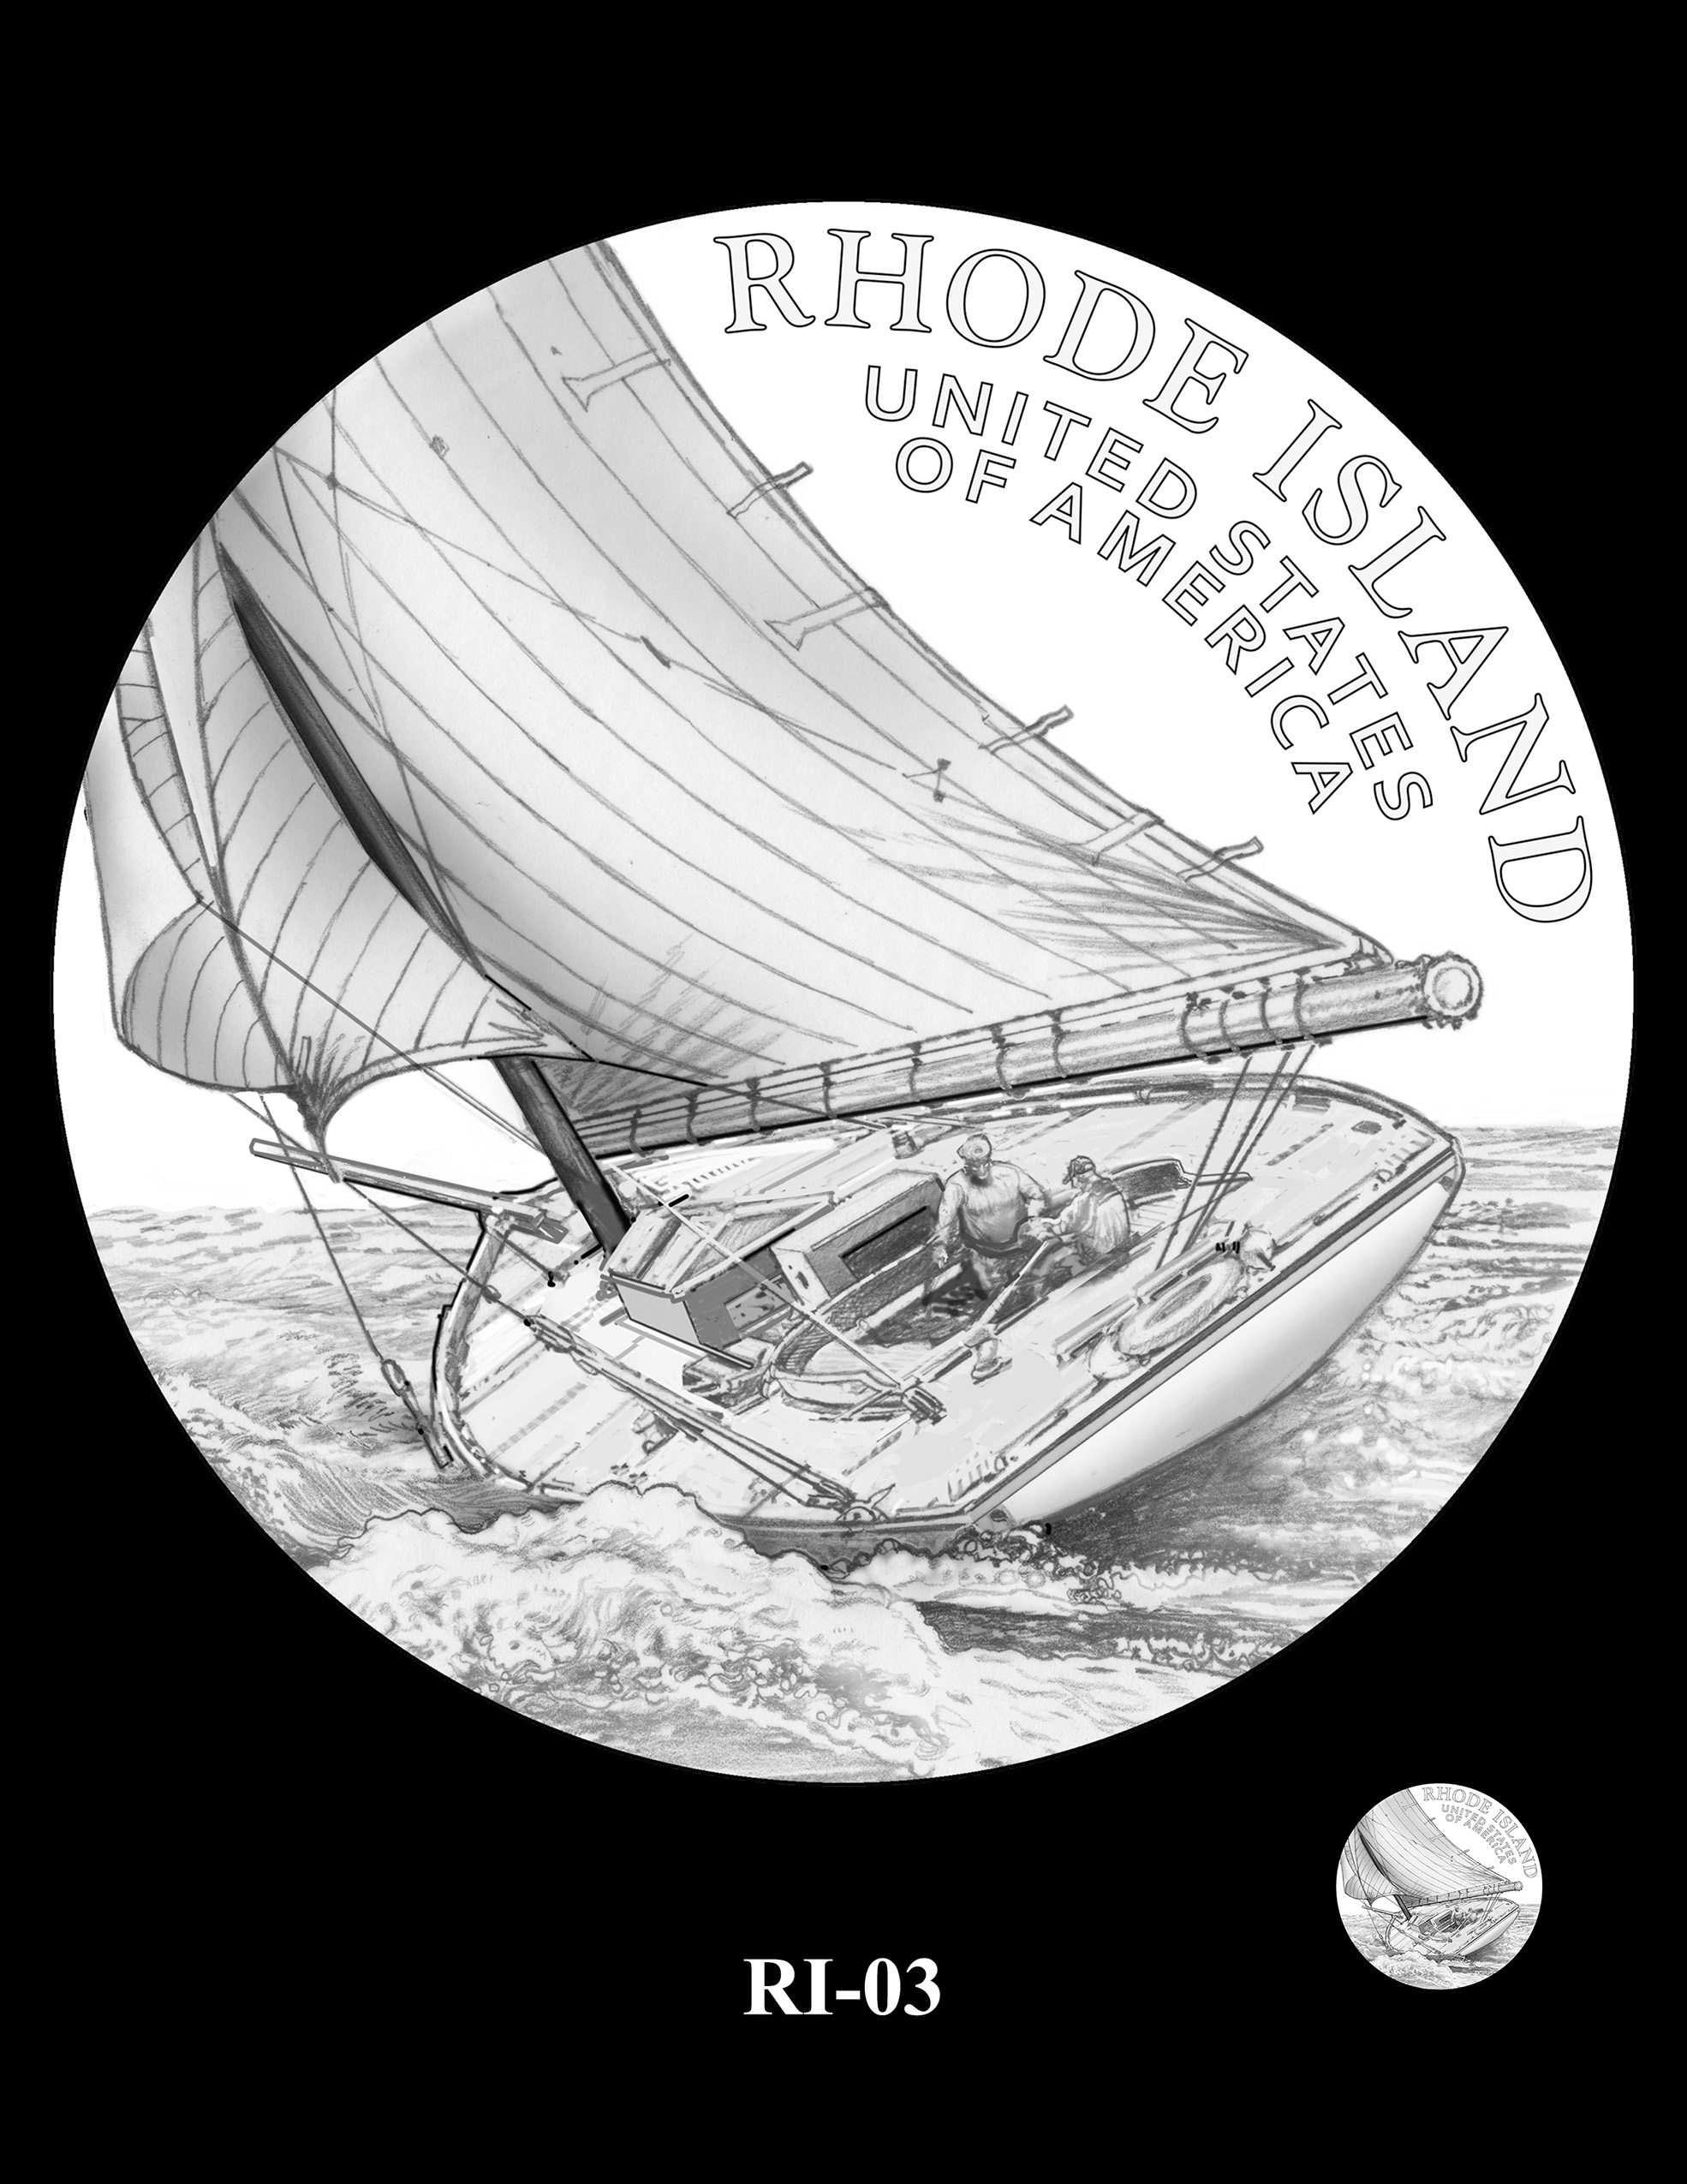 RI-03 -- 2022 American Innovation $1 Coin - Rhode Island